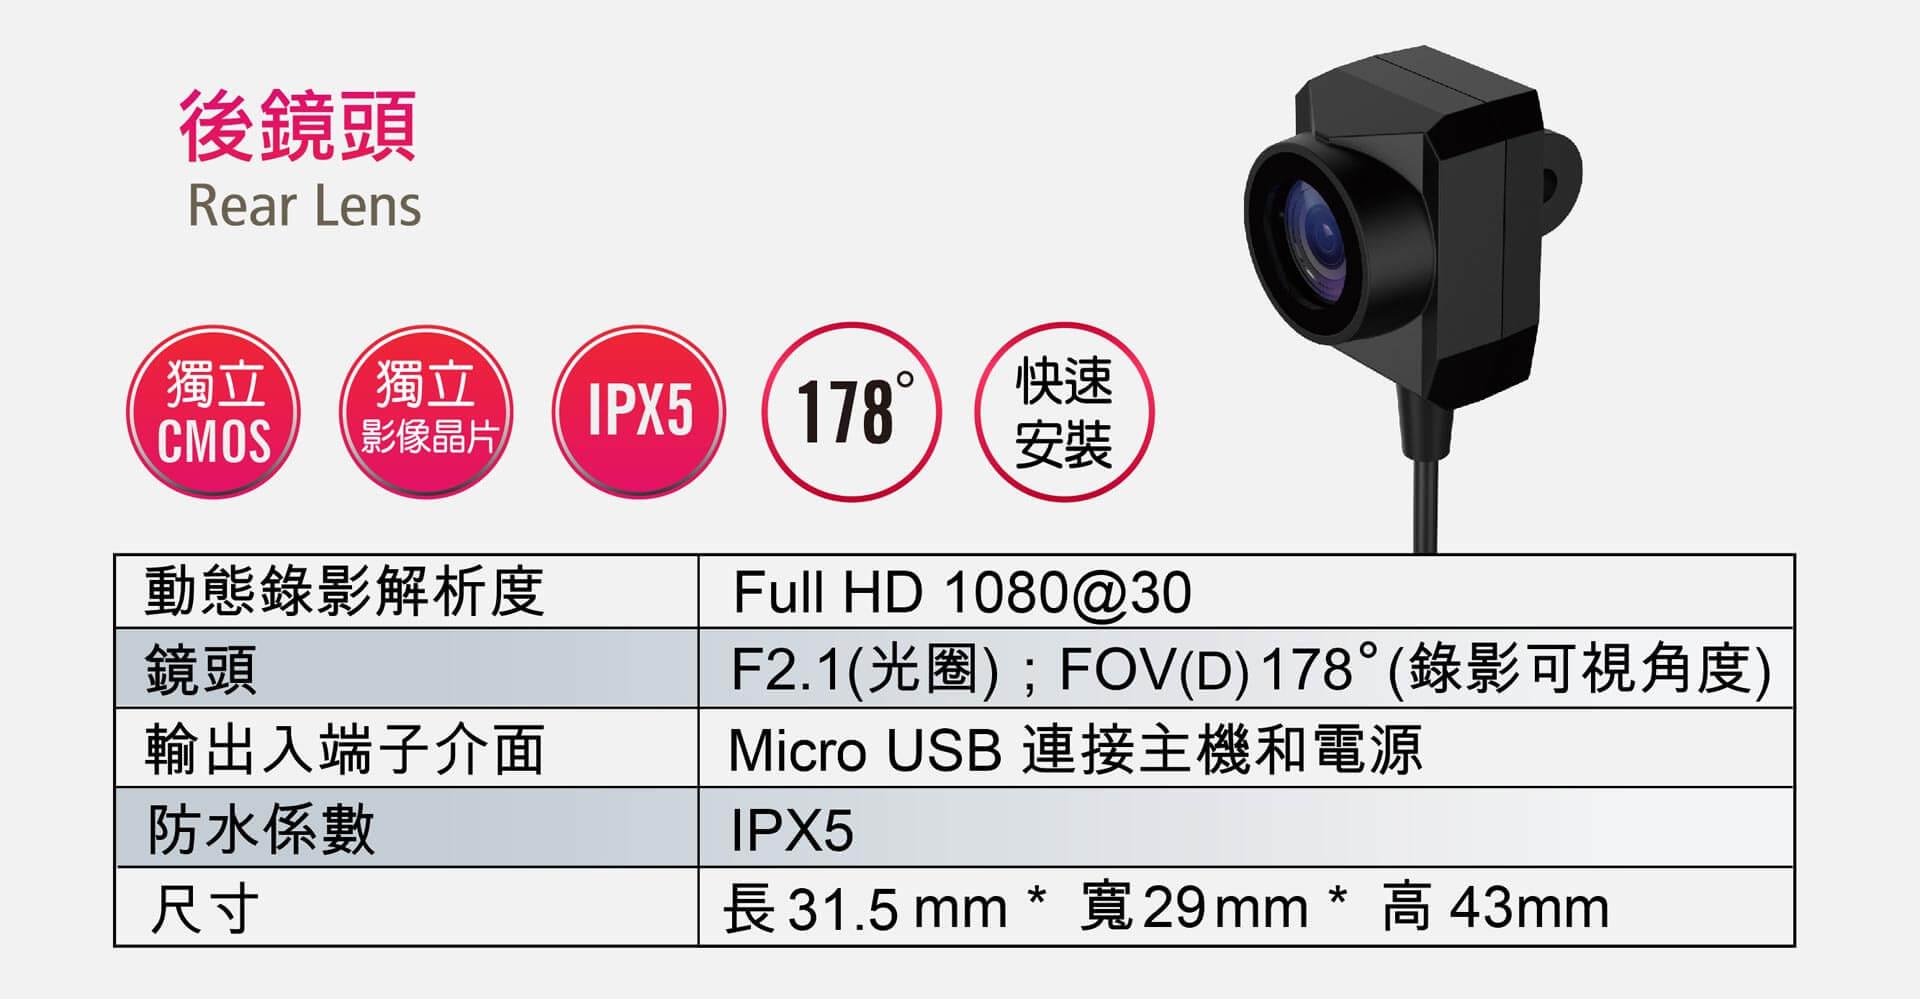 proimages/product/pro-01/pro-01-002/B62/B62-15-2.jpg